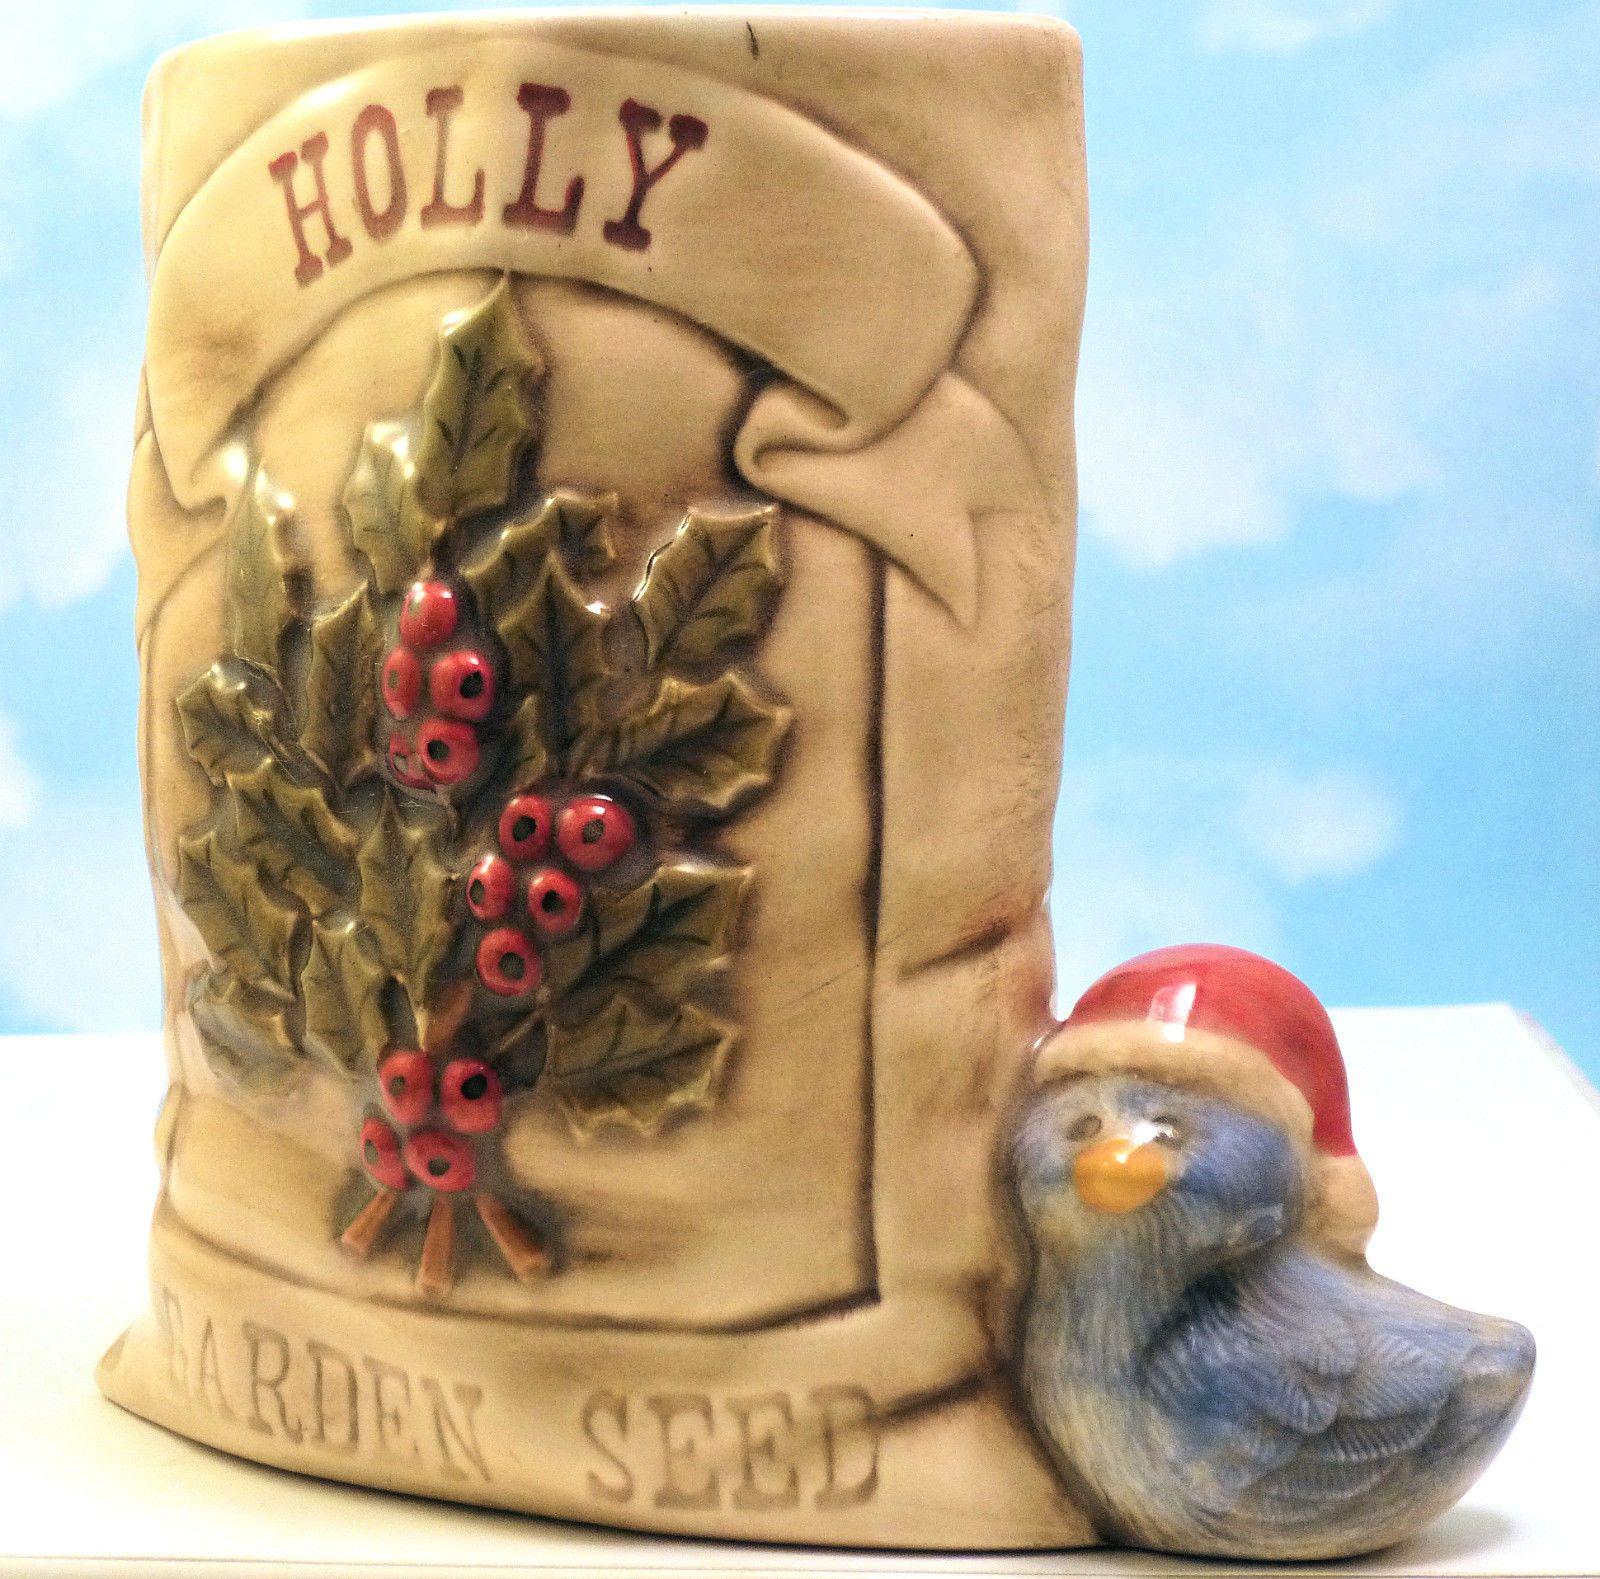 Little Santa Bird Holly Garden Seed Bag Vase Signed Christmas Hand Crafted | eBay